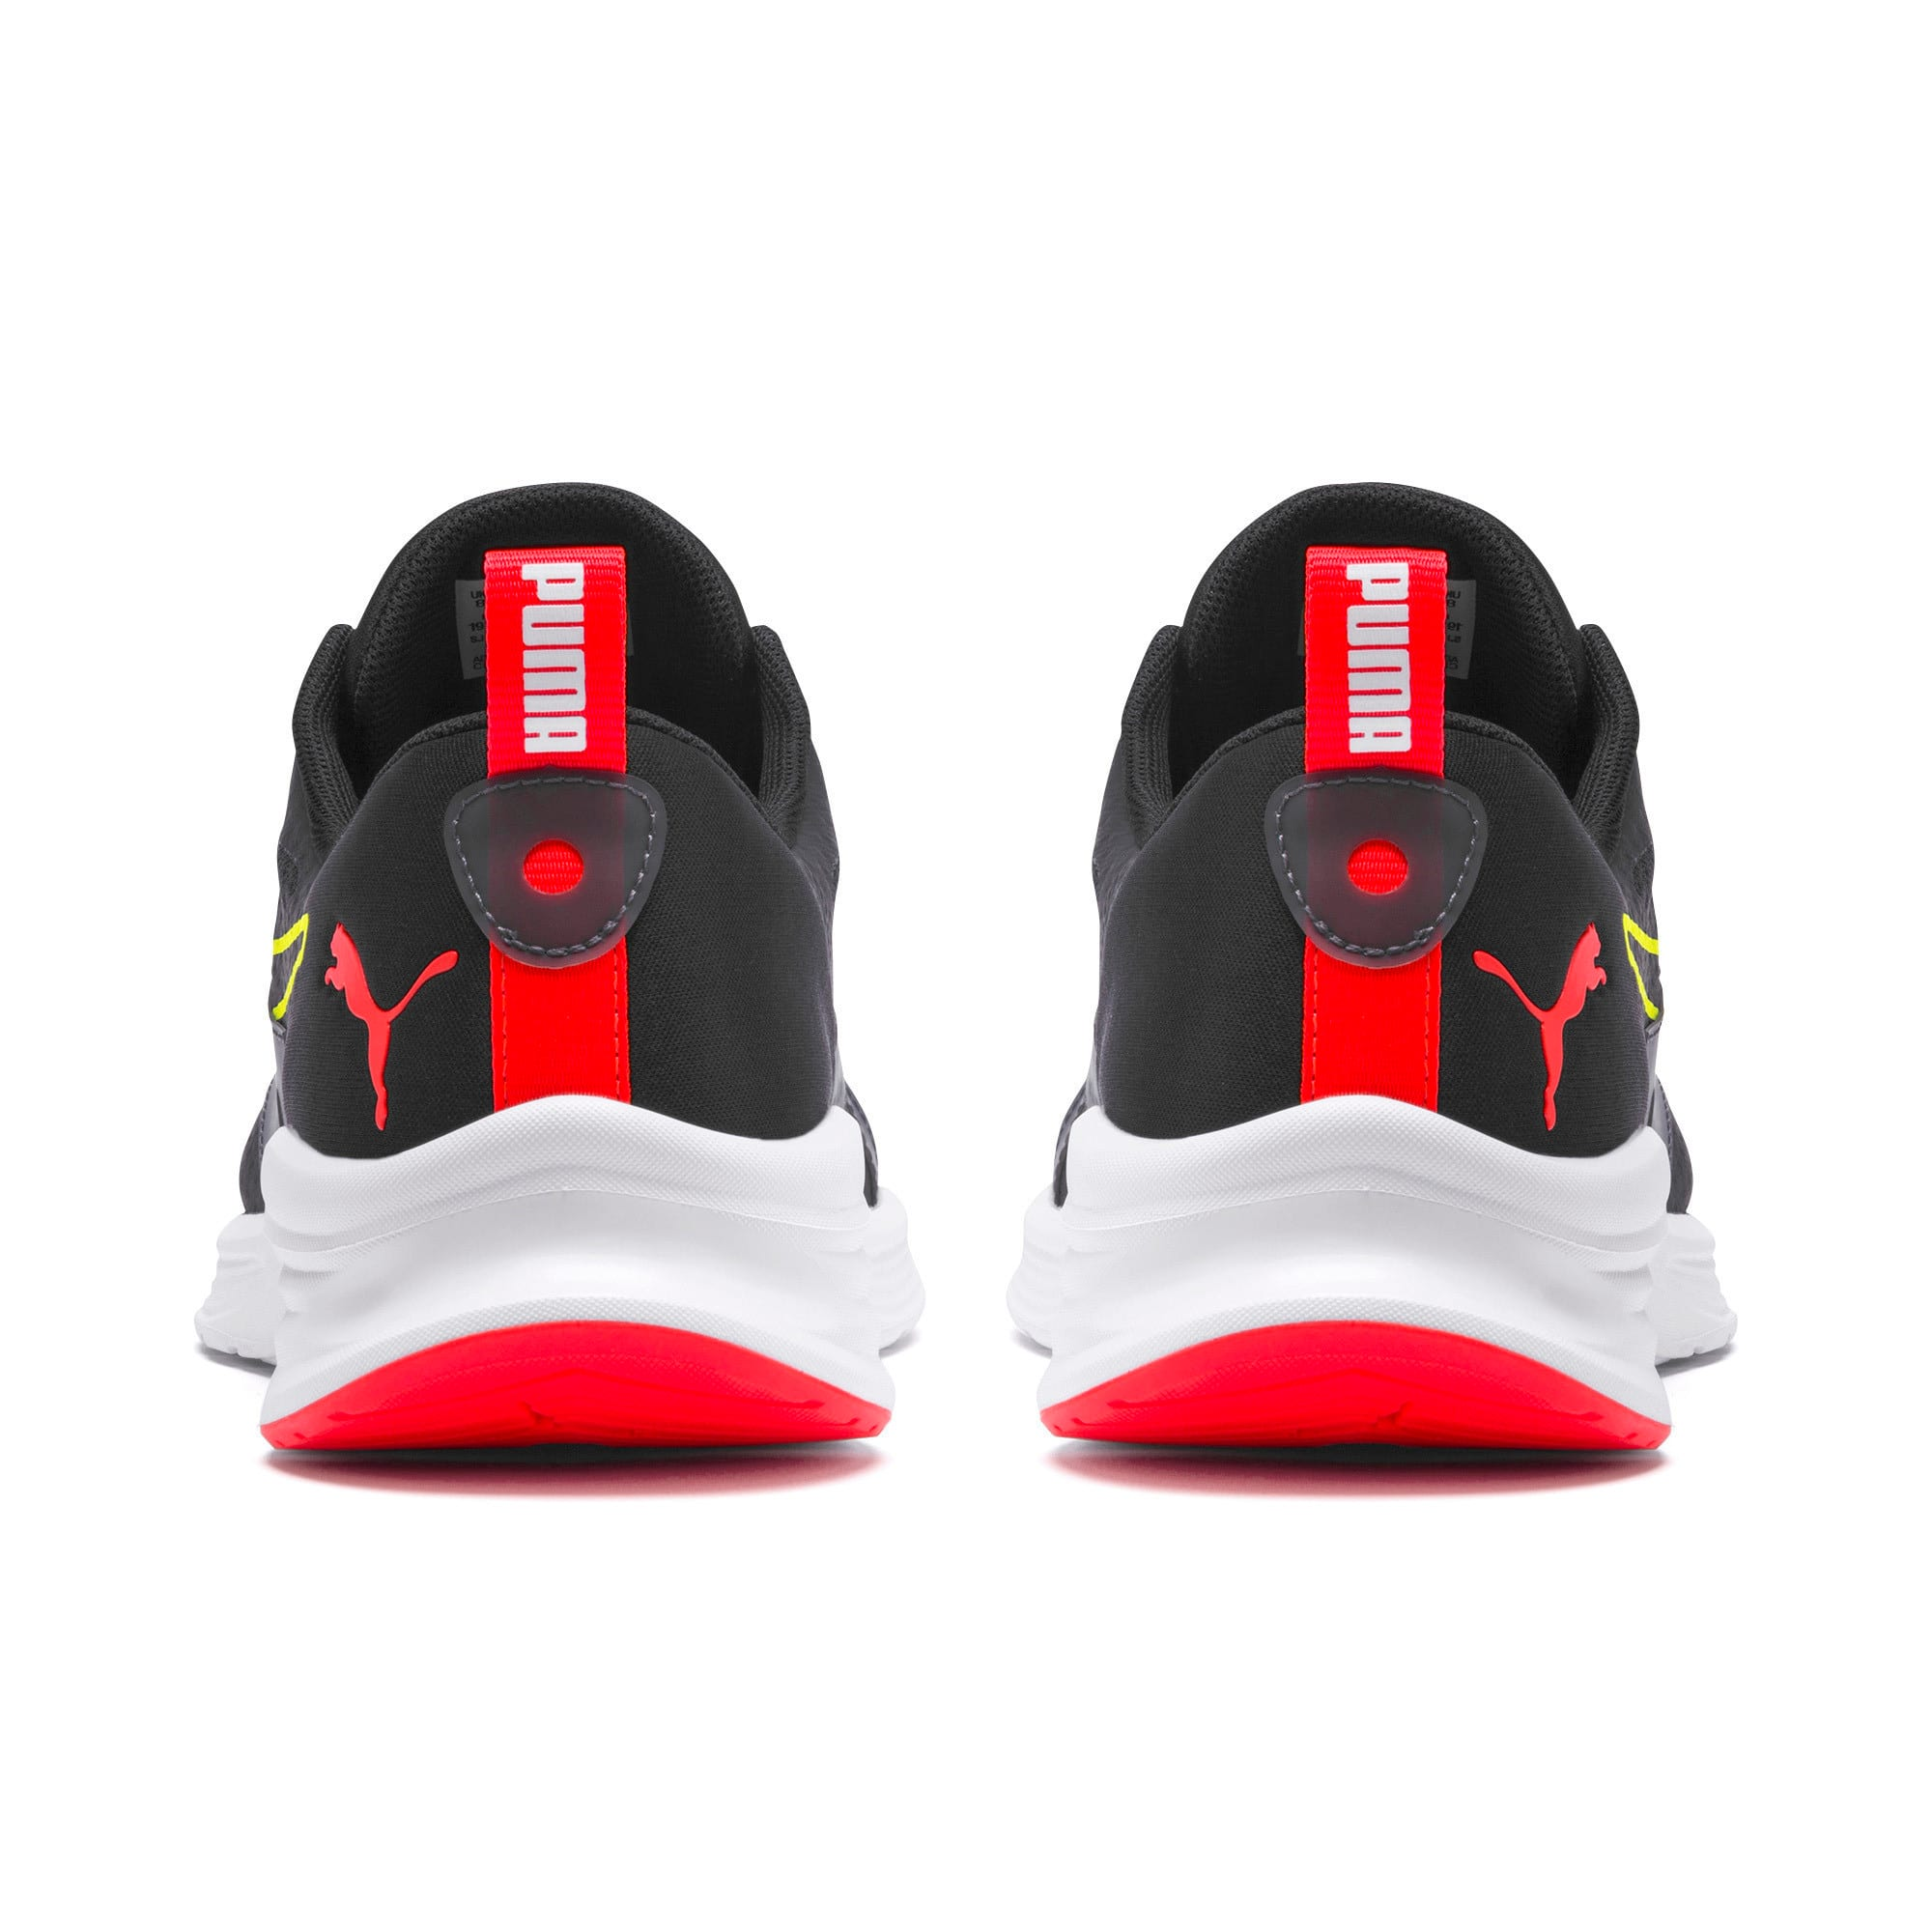 Thumbnail 4 of HYBRID Fuego Men's Running Shoes, Puma Black-Yellow Alert, medium-IND